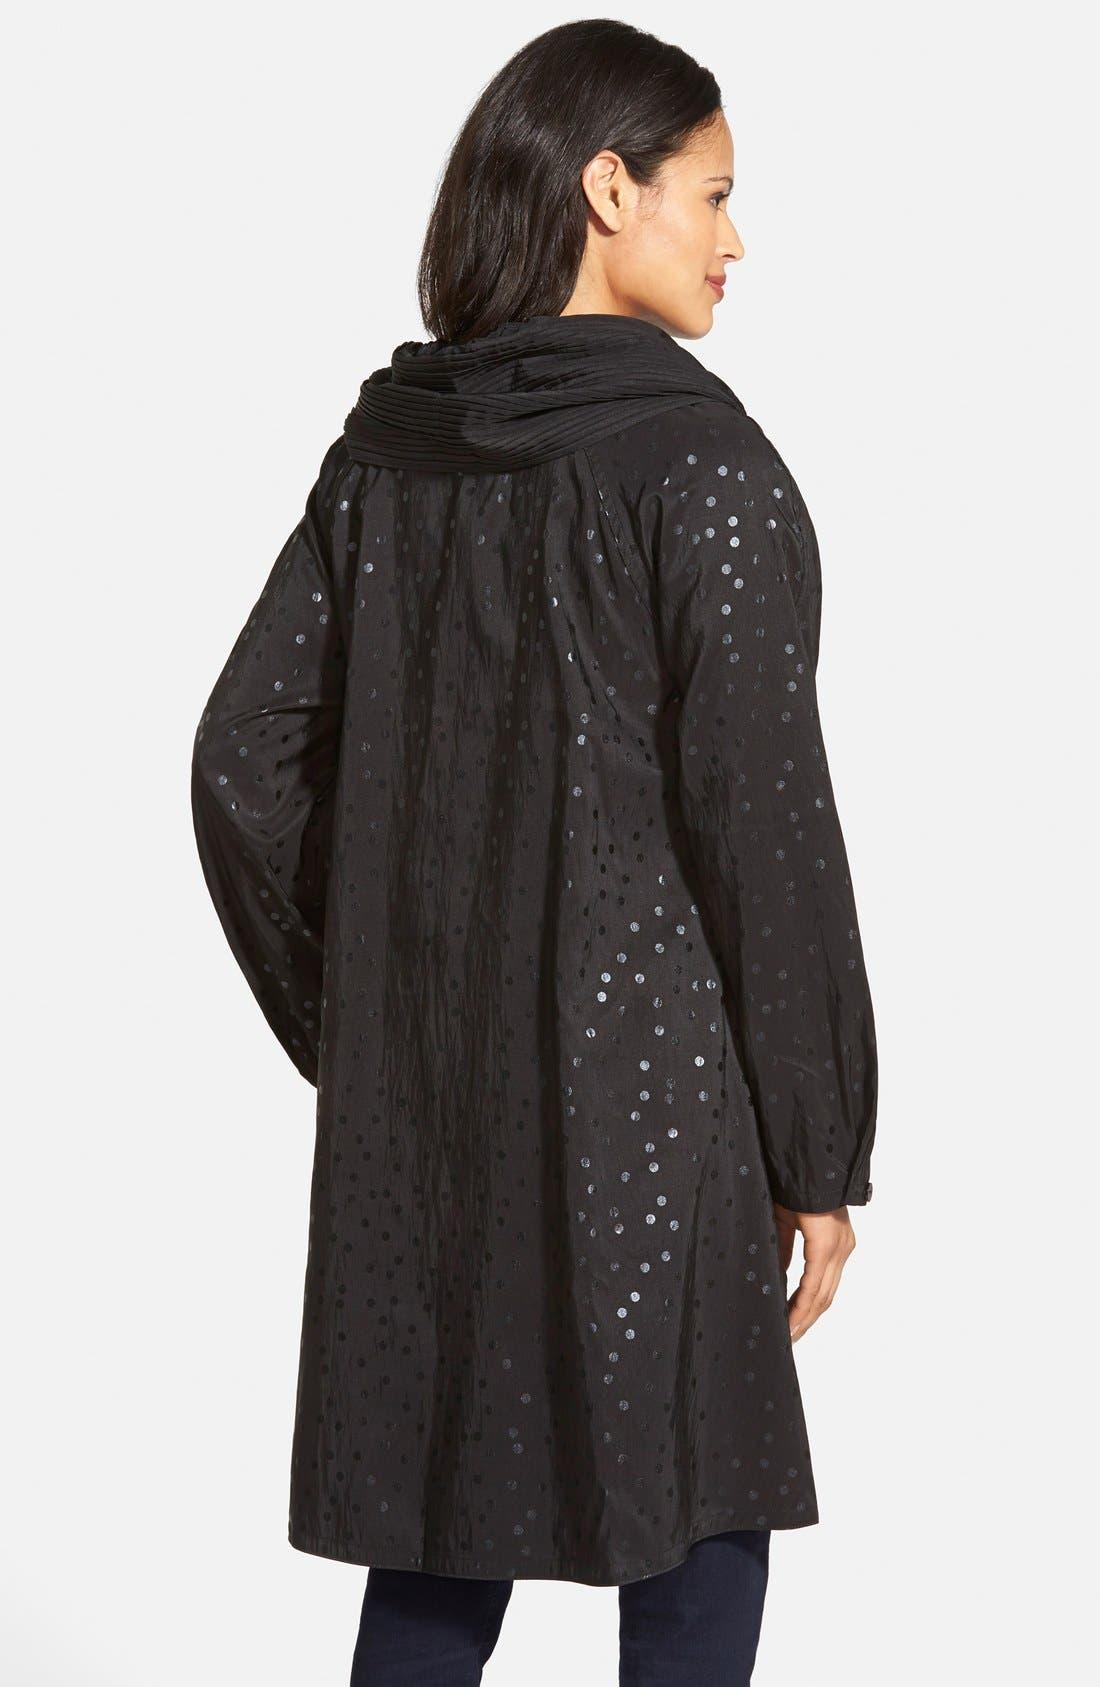 'Donatella' Reversible Dot Pleat Hood Packable Travel Coat,                             Alternate thumbnail 7, color,                             017